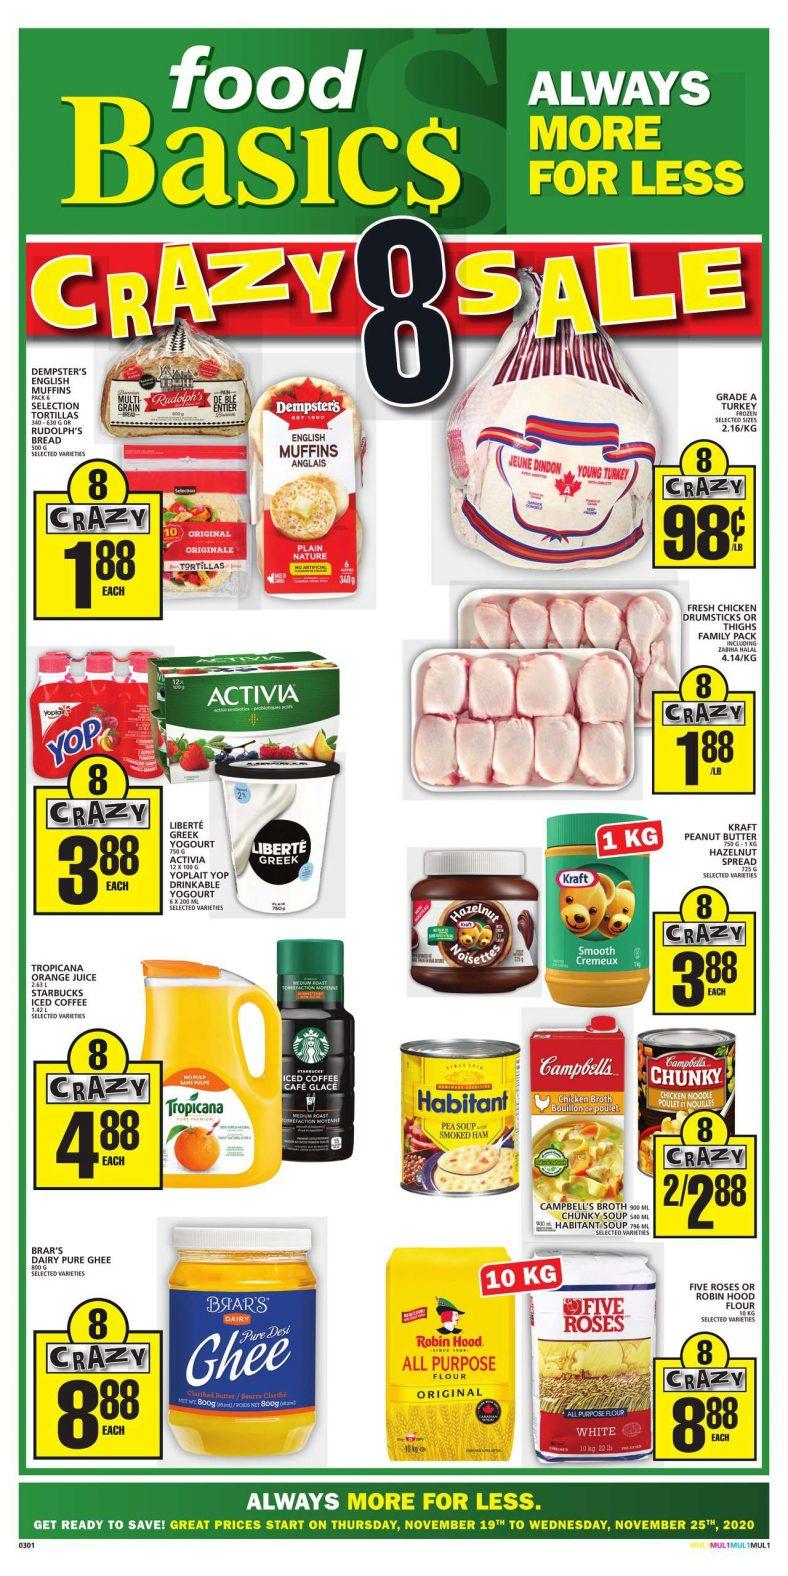 01 Food Basics Flyer November 19 November 25 2020